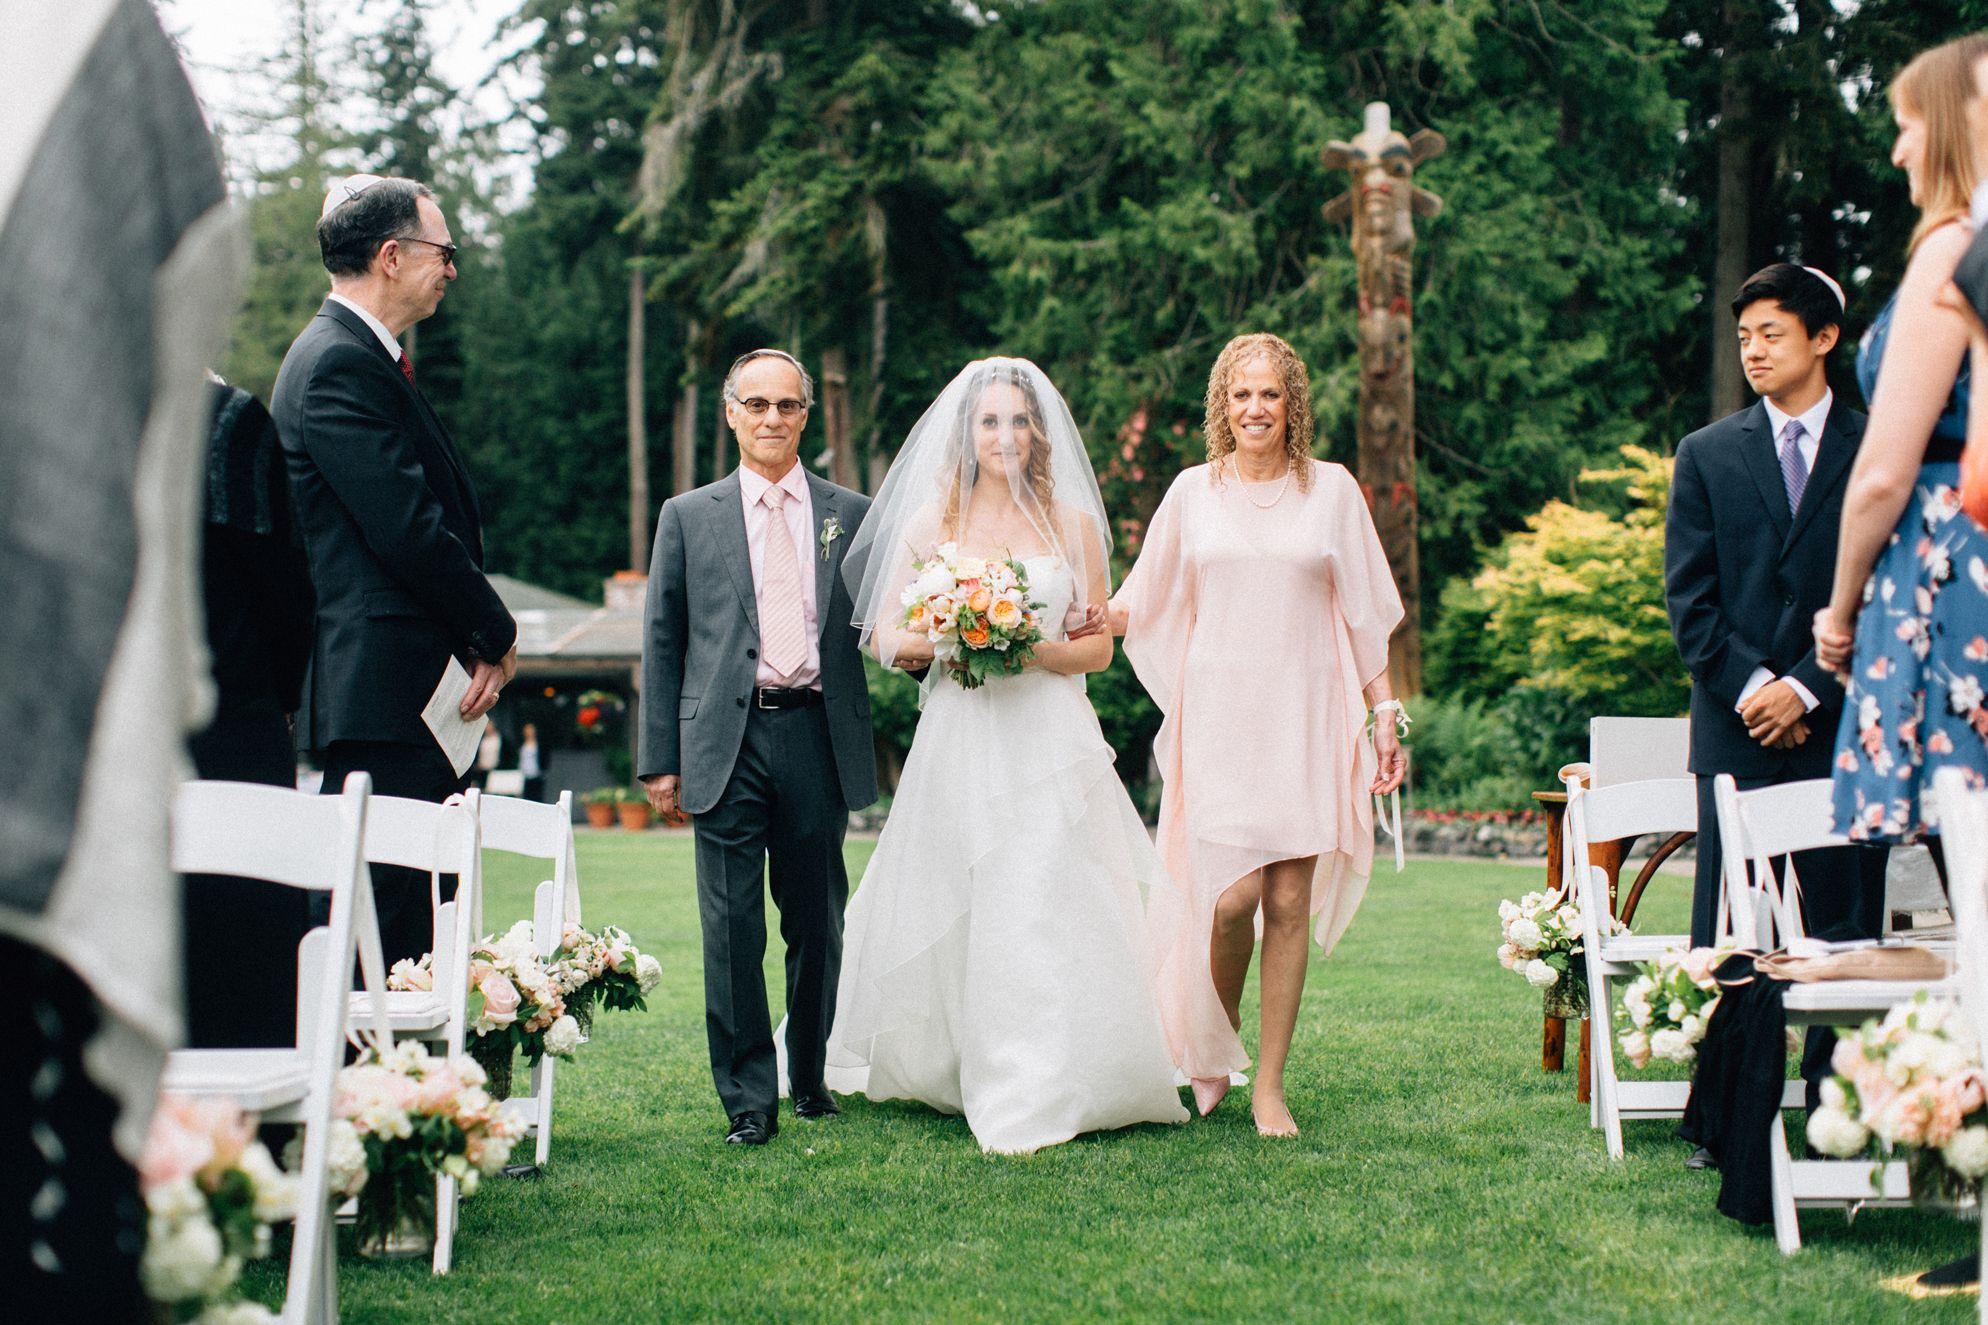 Jcrew wedding dress  Organic  Romantic Puget Sound Wedding  Vaulting Romantic and